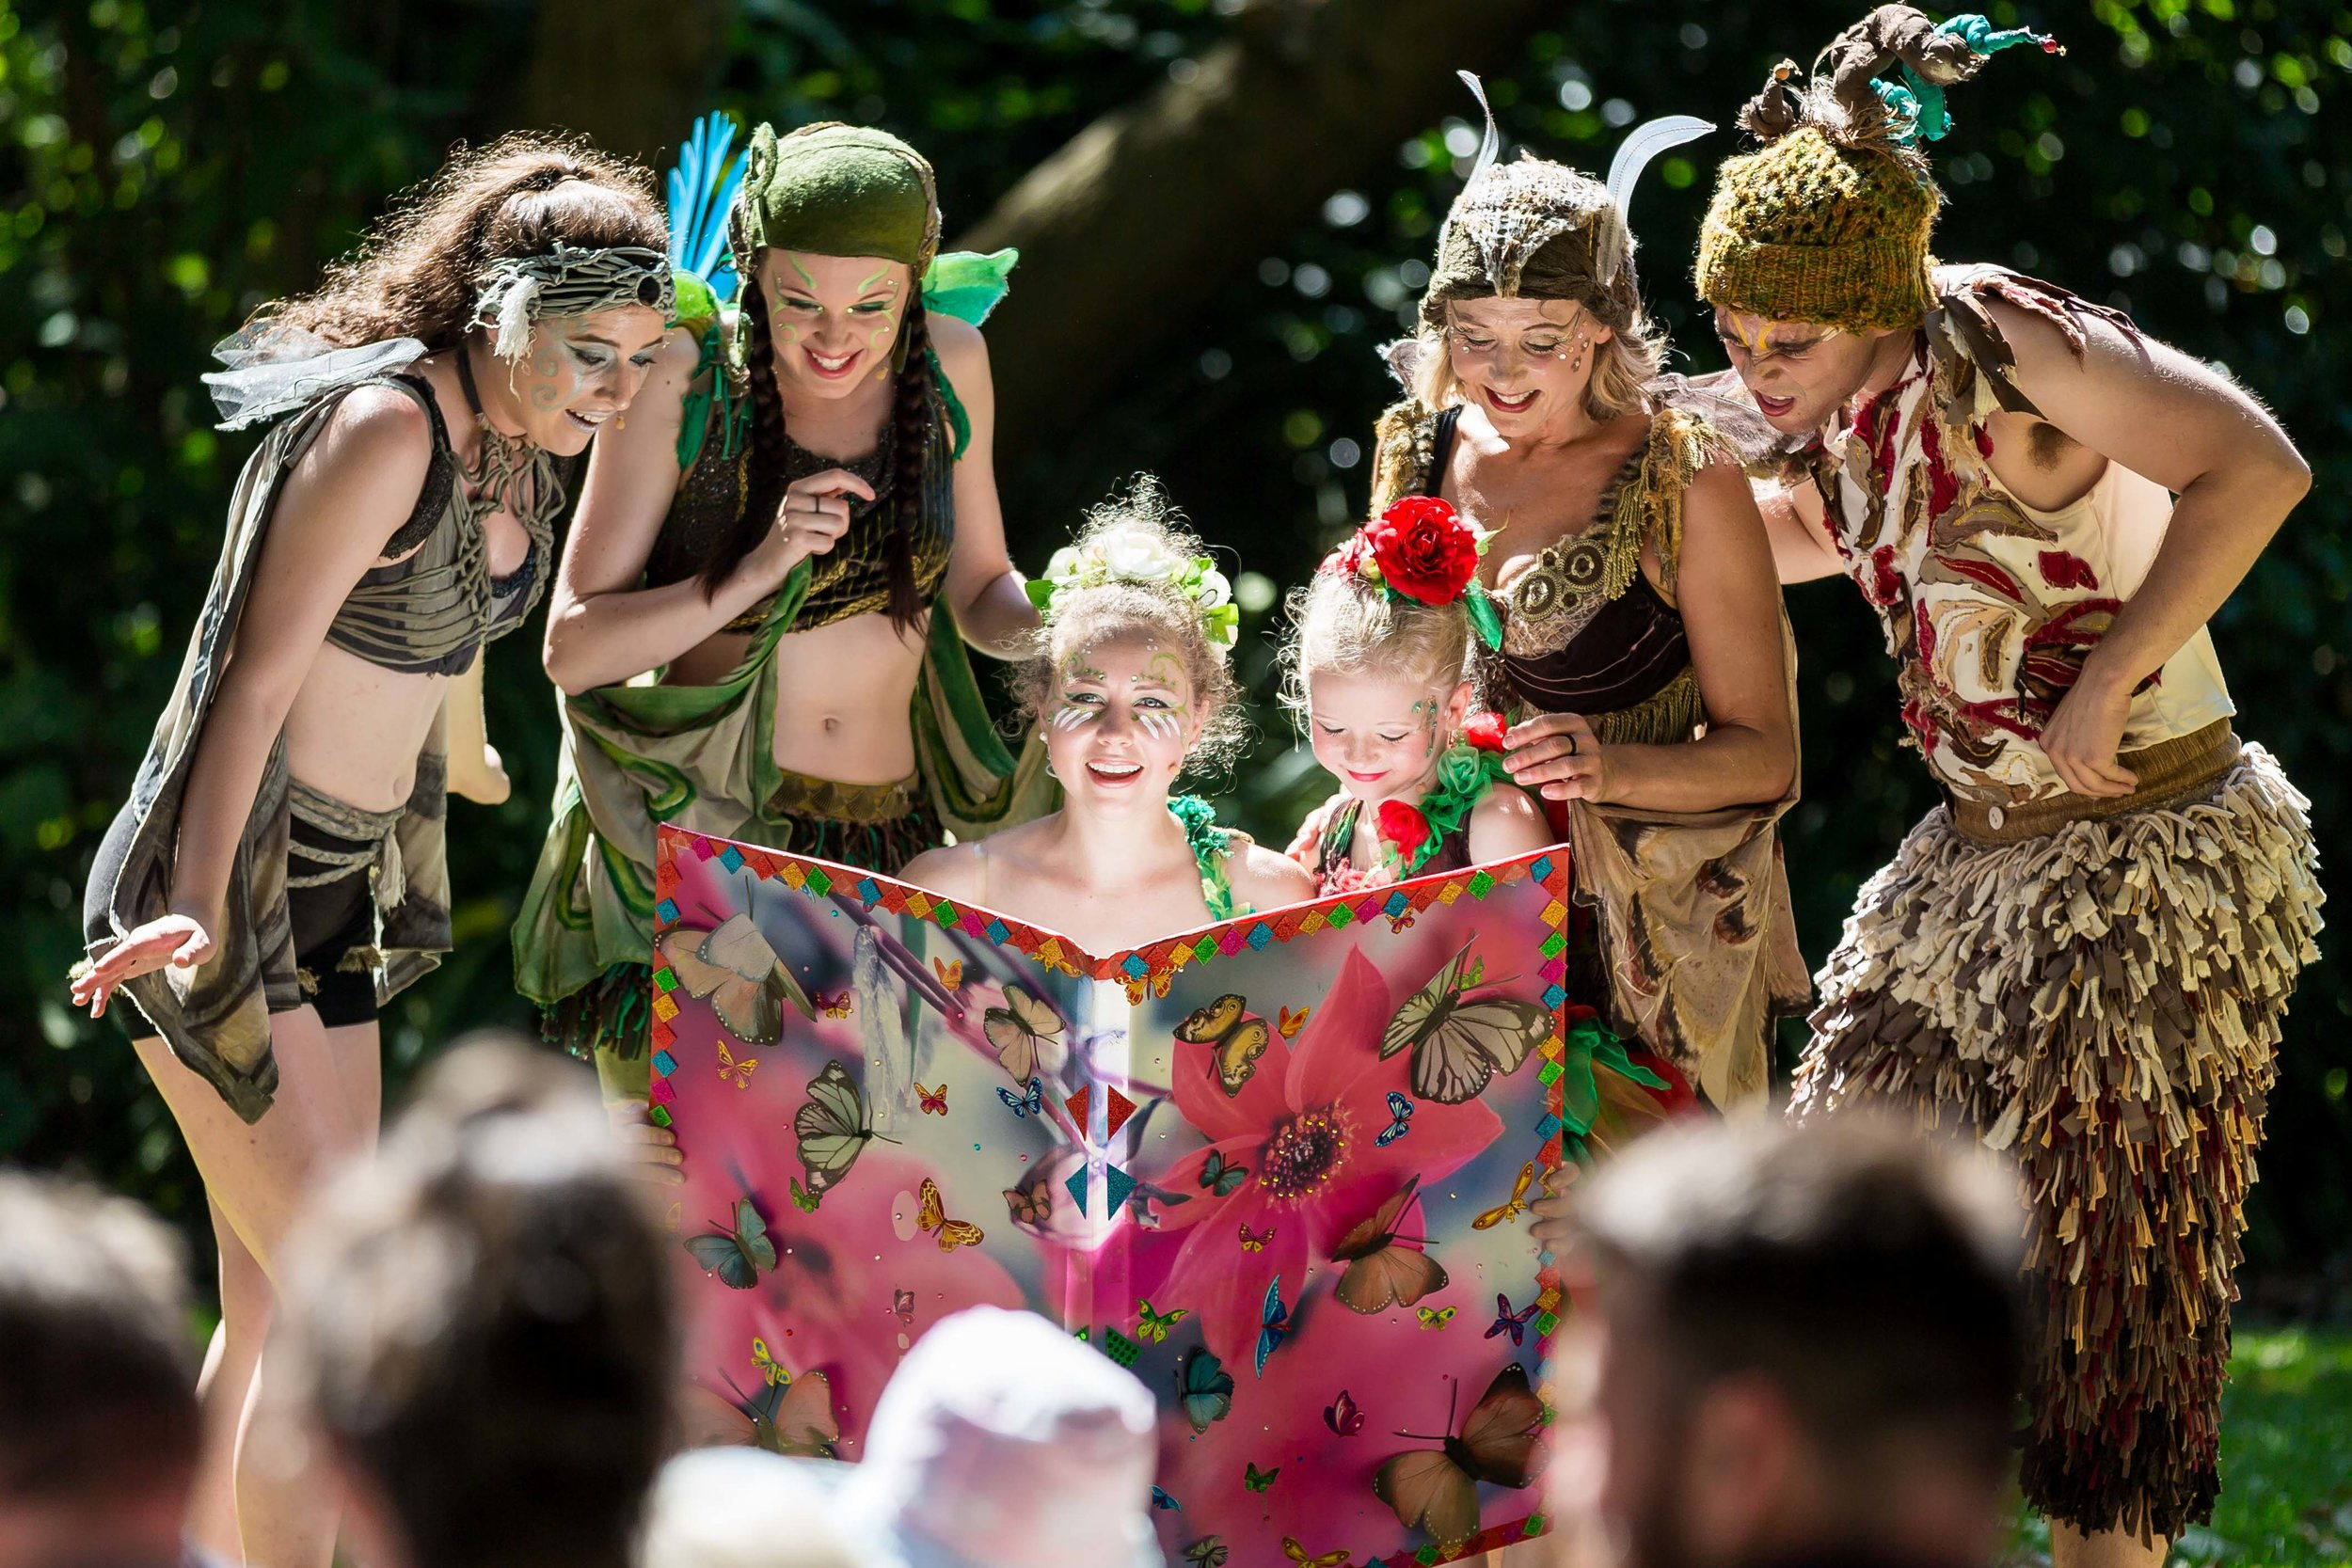 Photo credit: The Australian Shakespeare Company